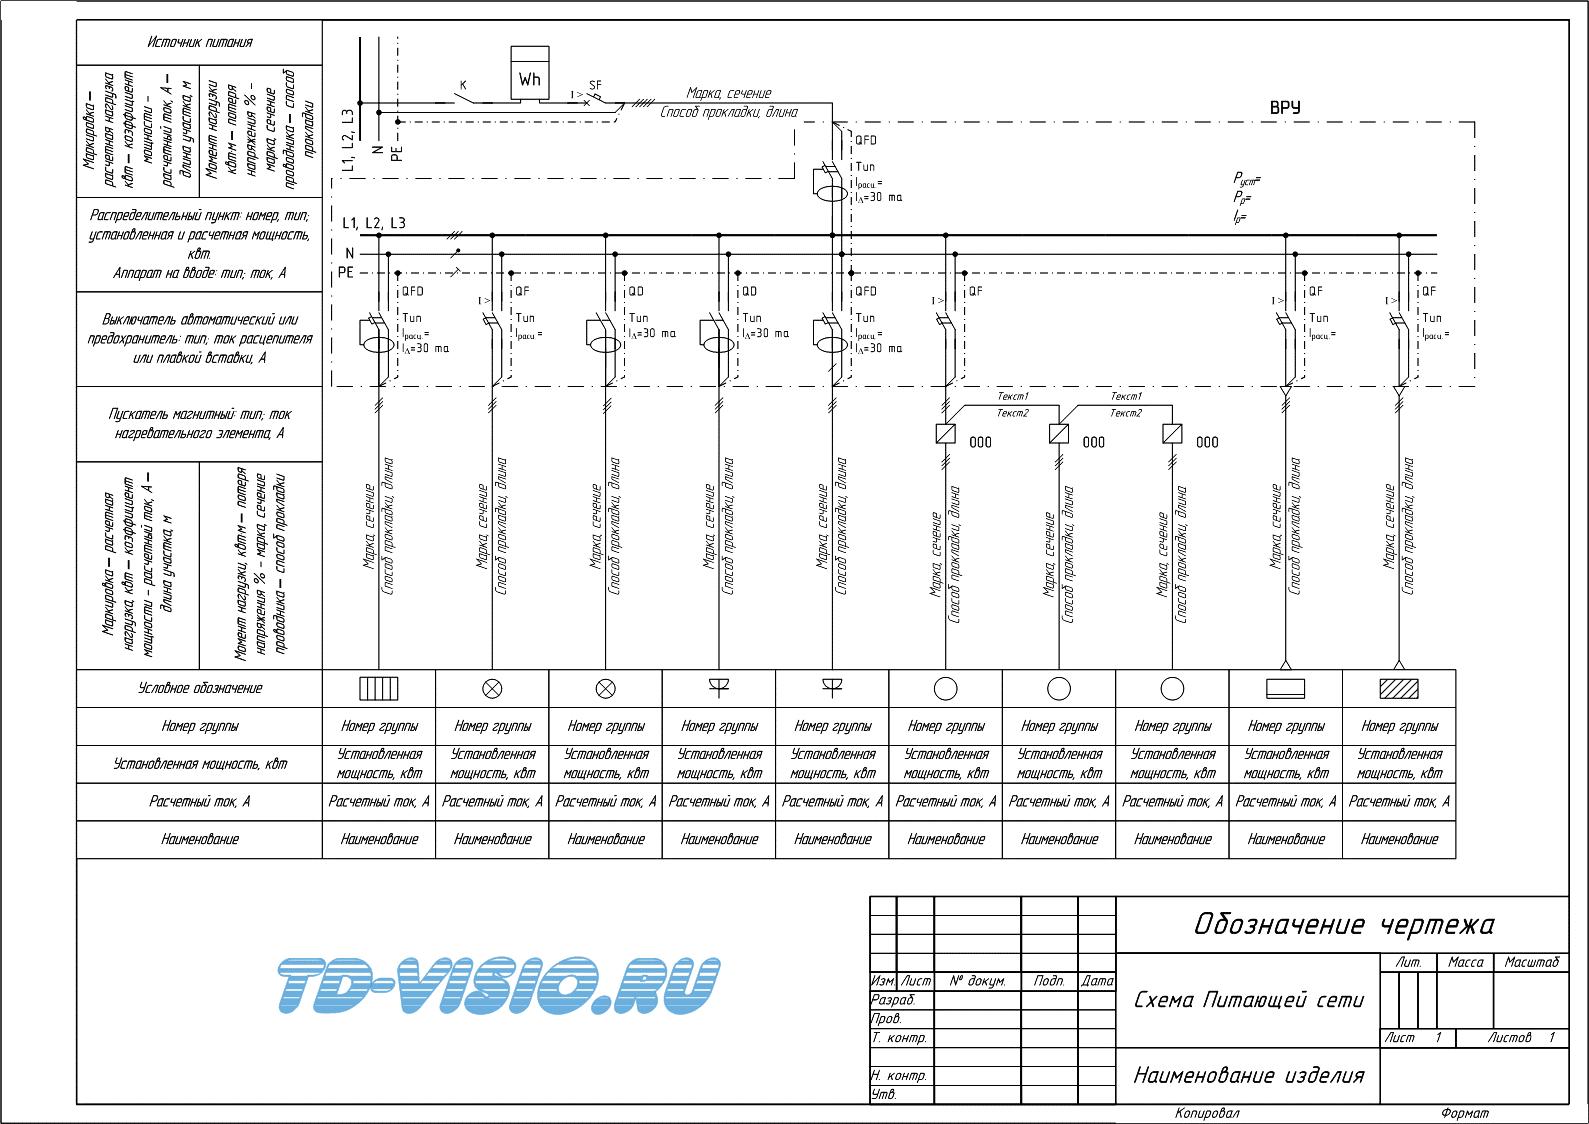 Однолинейная схема visio